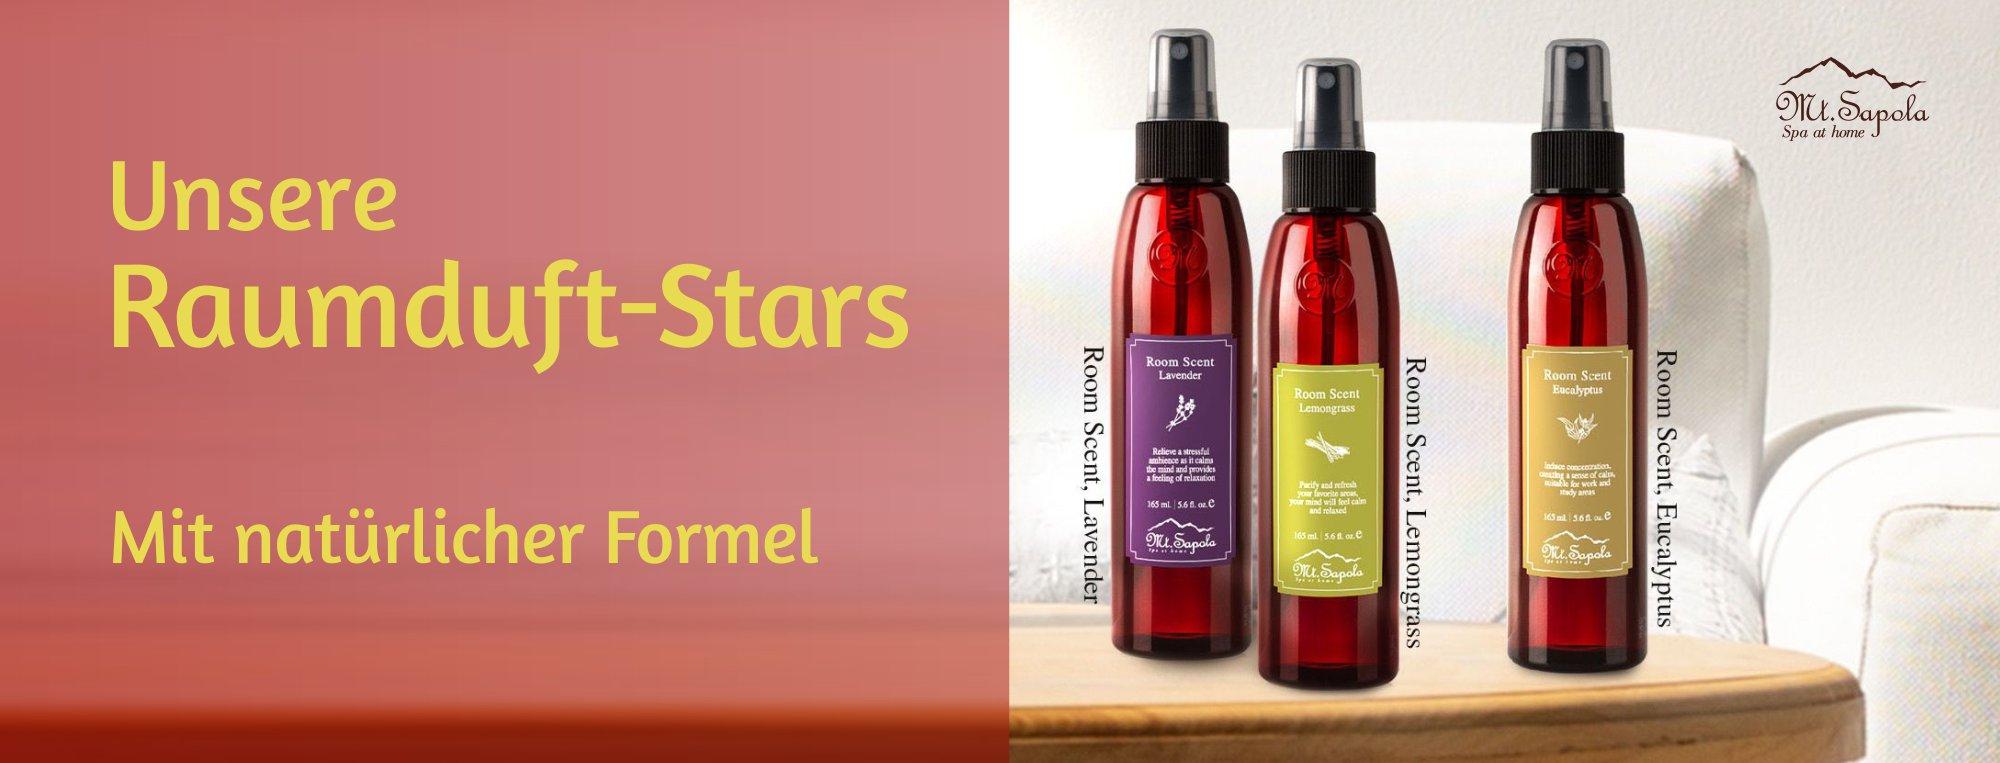 mtsapola-shop.de/home-spa/room-sprays